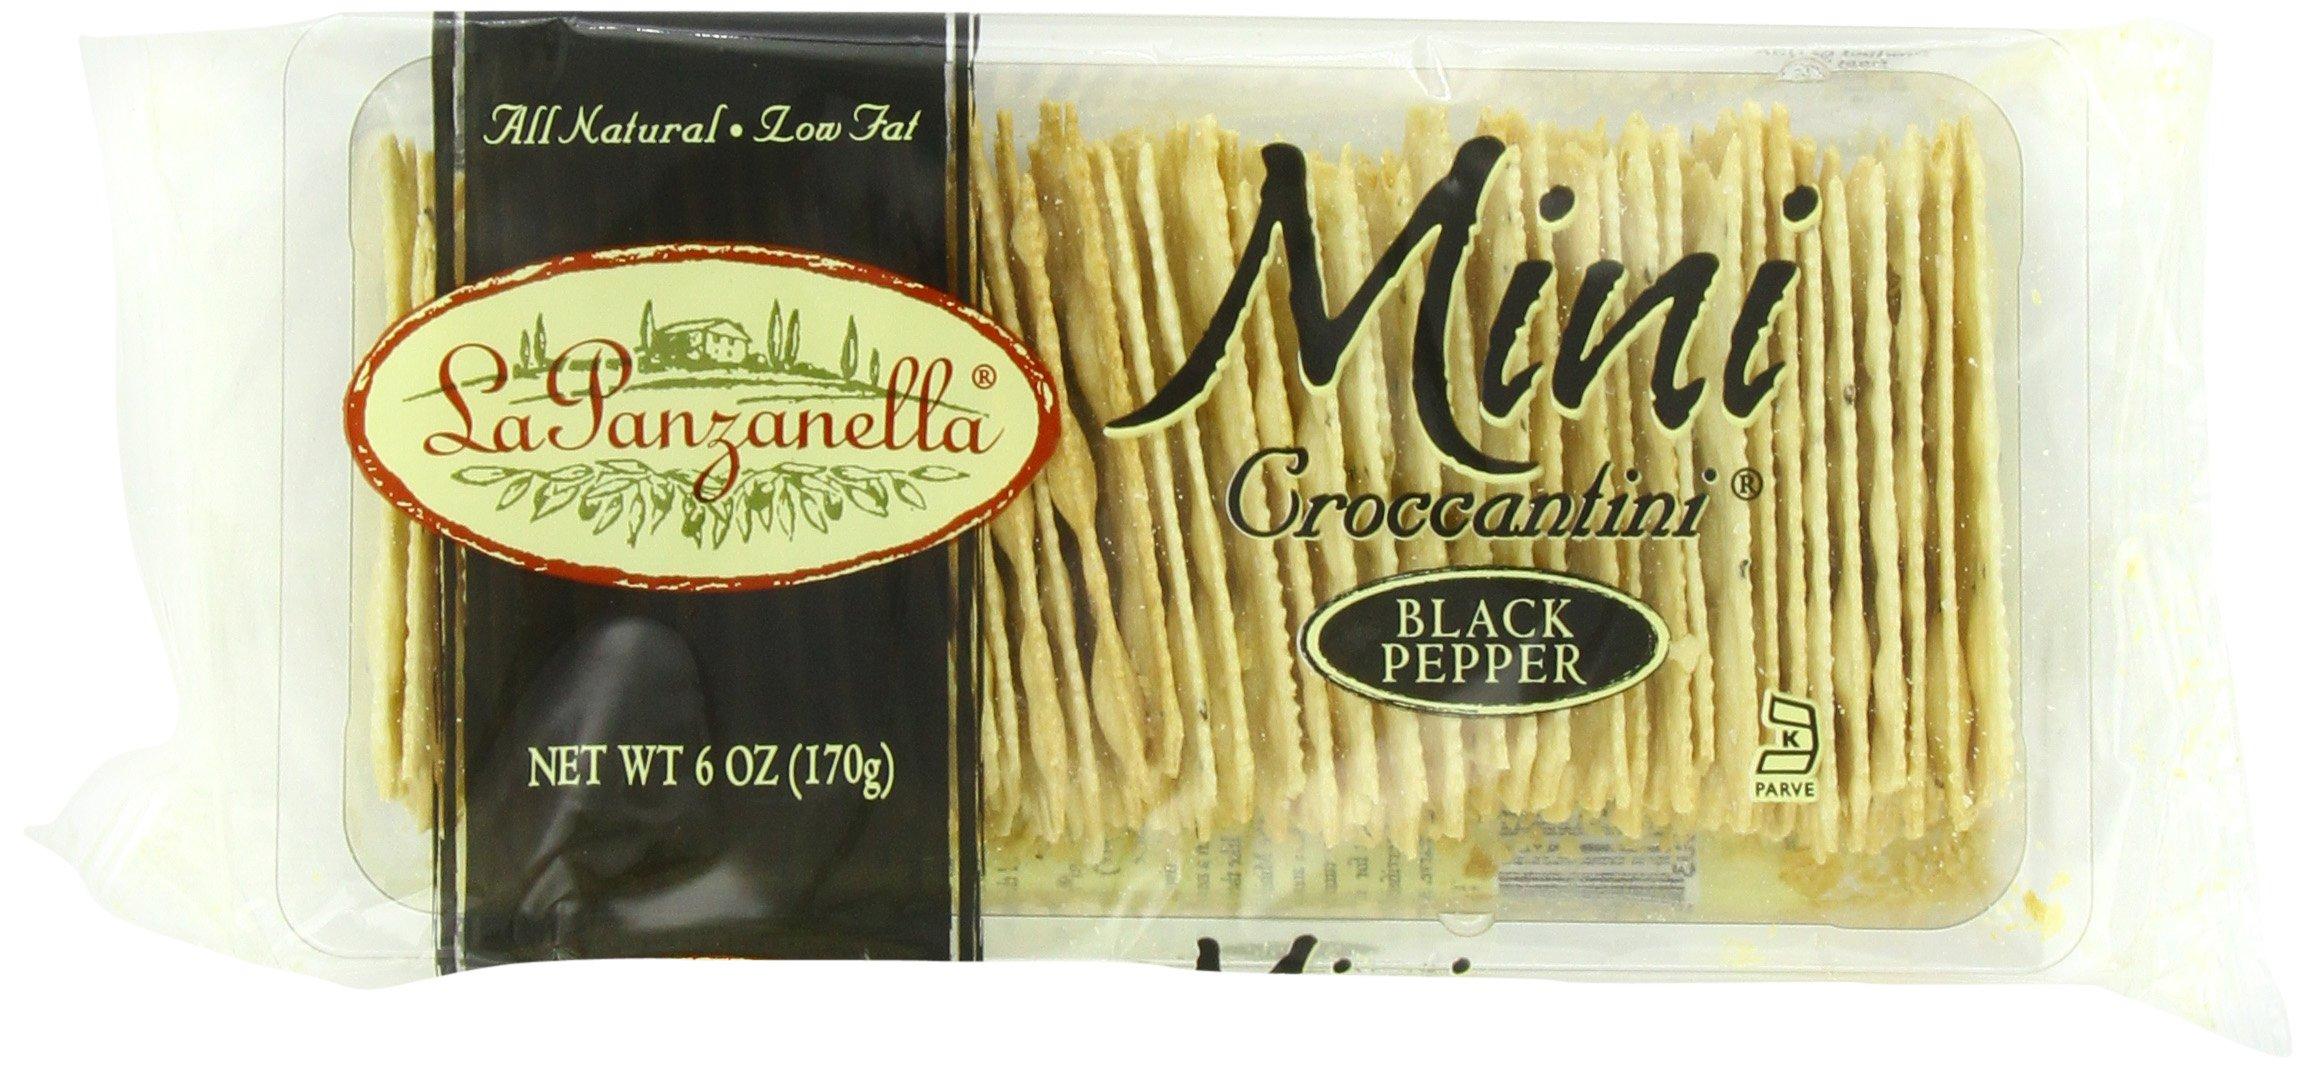 La Panzanella Black Pepper Mini Croccantini, 6-Ounce Packages (Pack of 6)